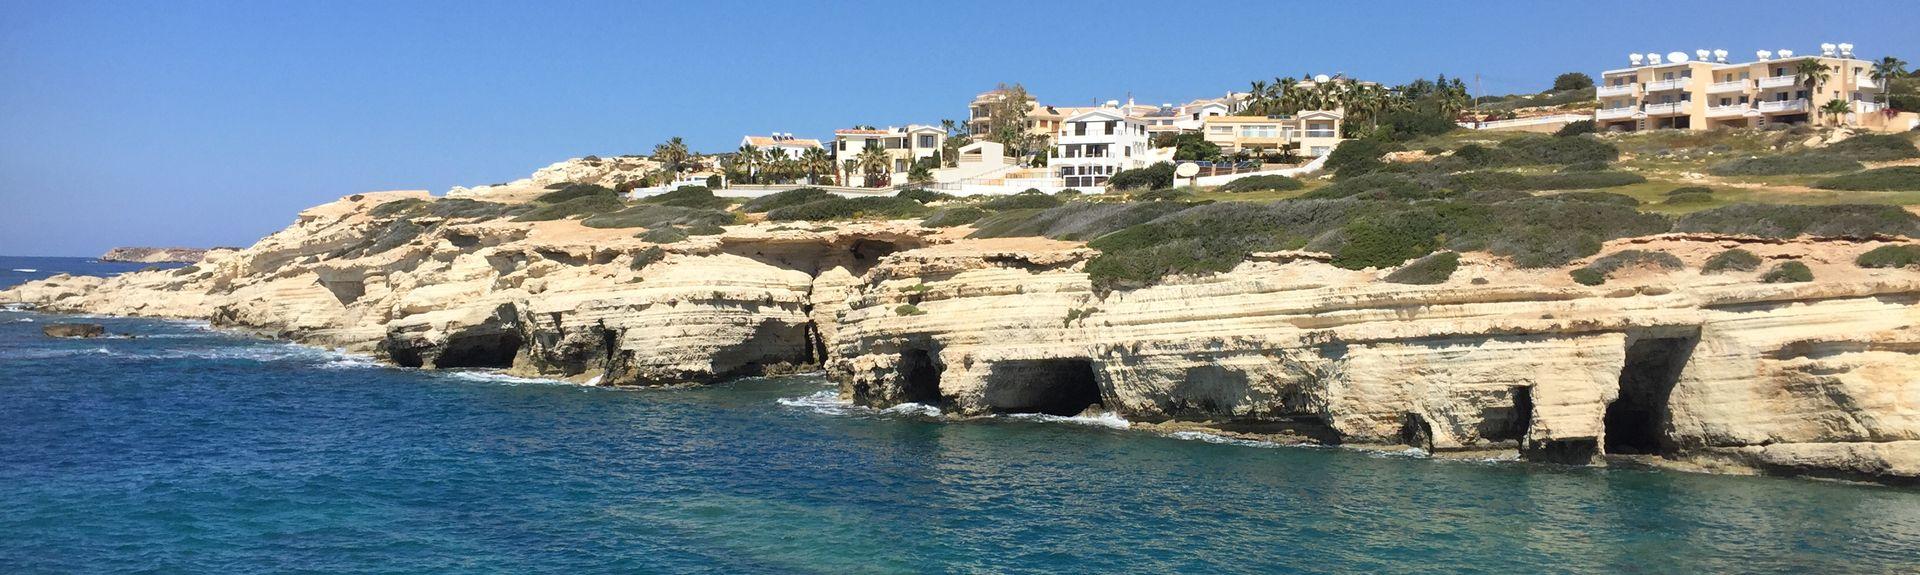 Mesa Chorio, Bezirk Paphos, Zypern